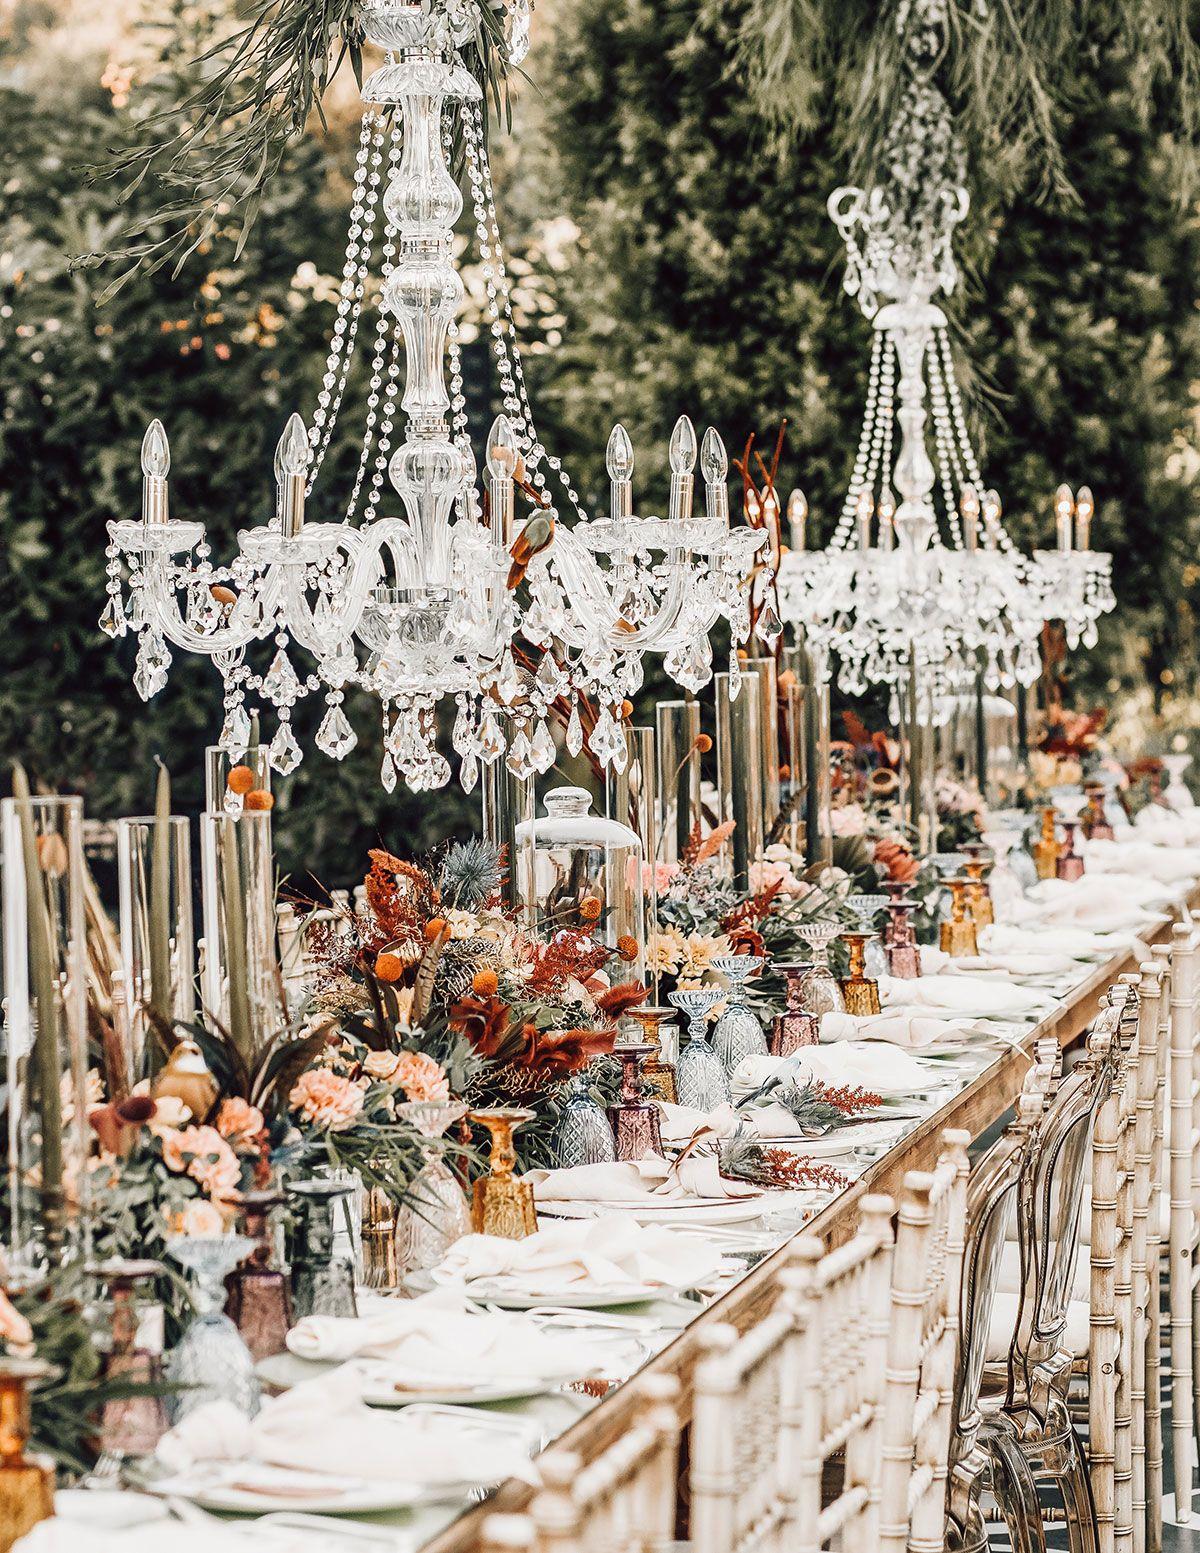 GLAMOROUS FLORAL FUSED BODRUM LUXURY WEDDING AT VILLA MACAKIZI MUGLA BY DEPLANV